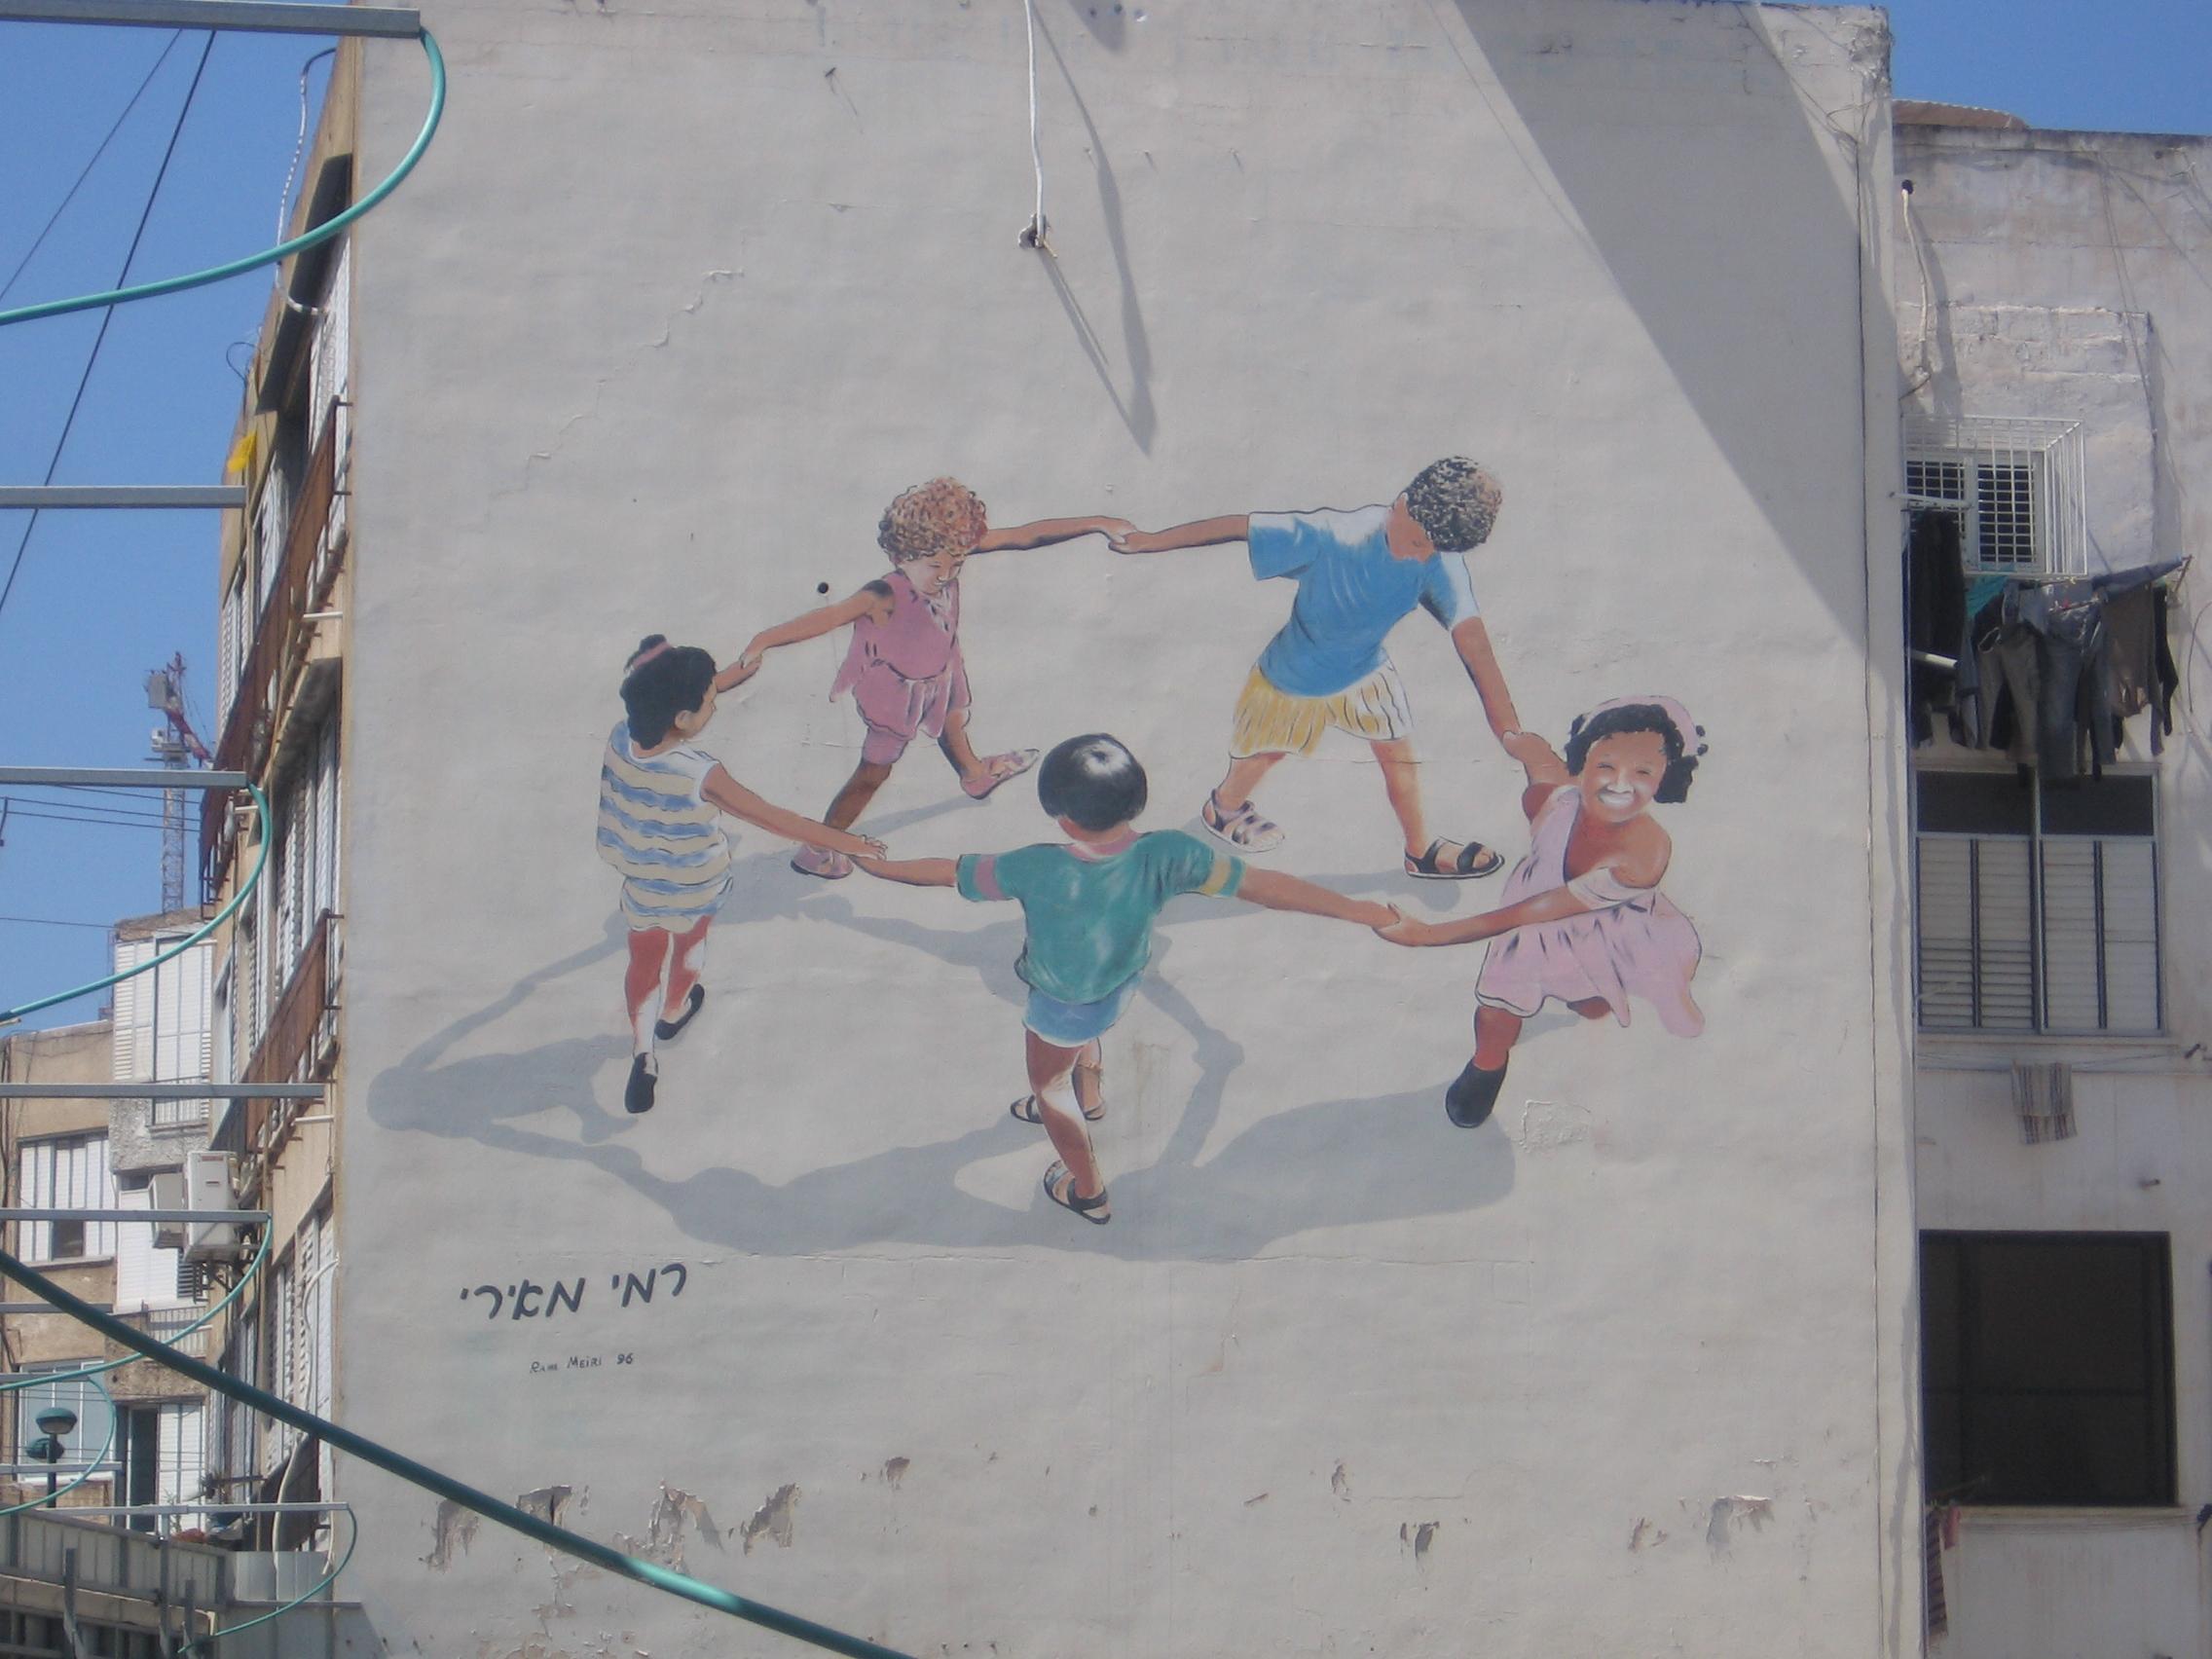 Mural of children dancing